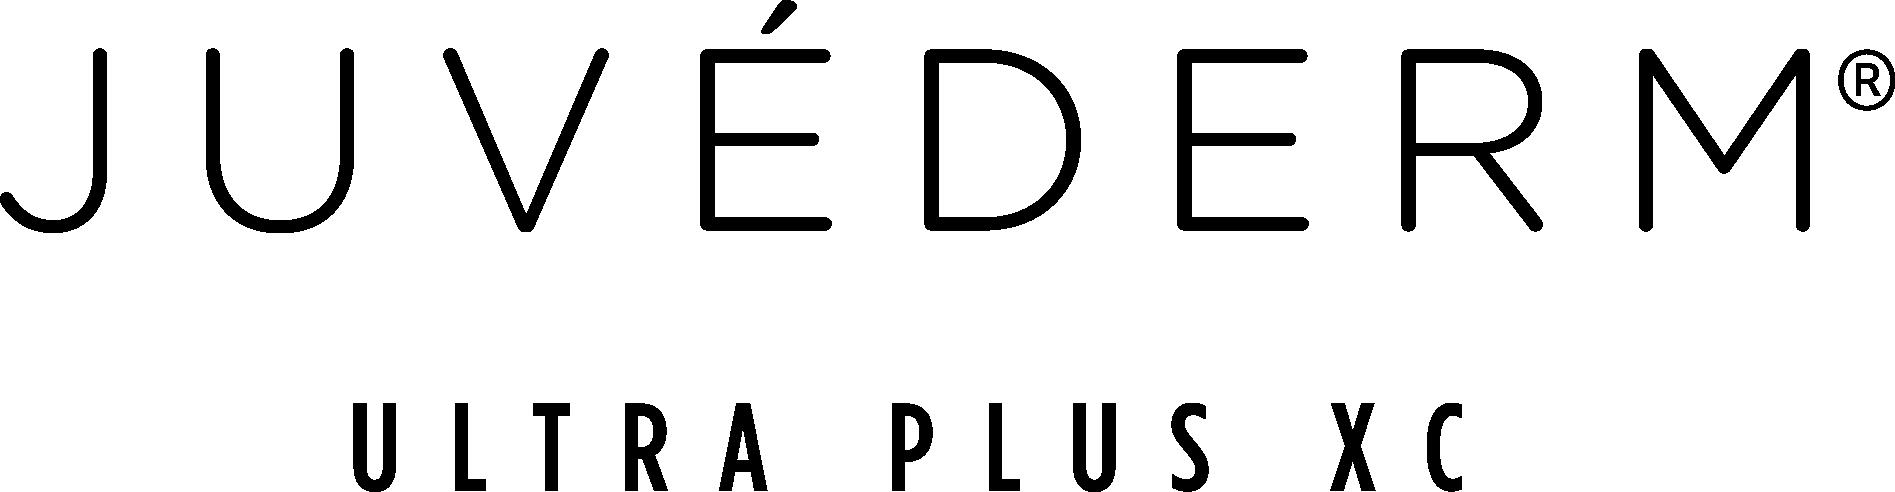 Juvederm Ultra Plus XC Logo